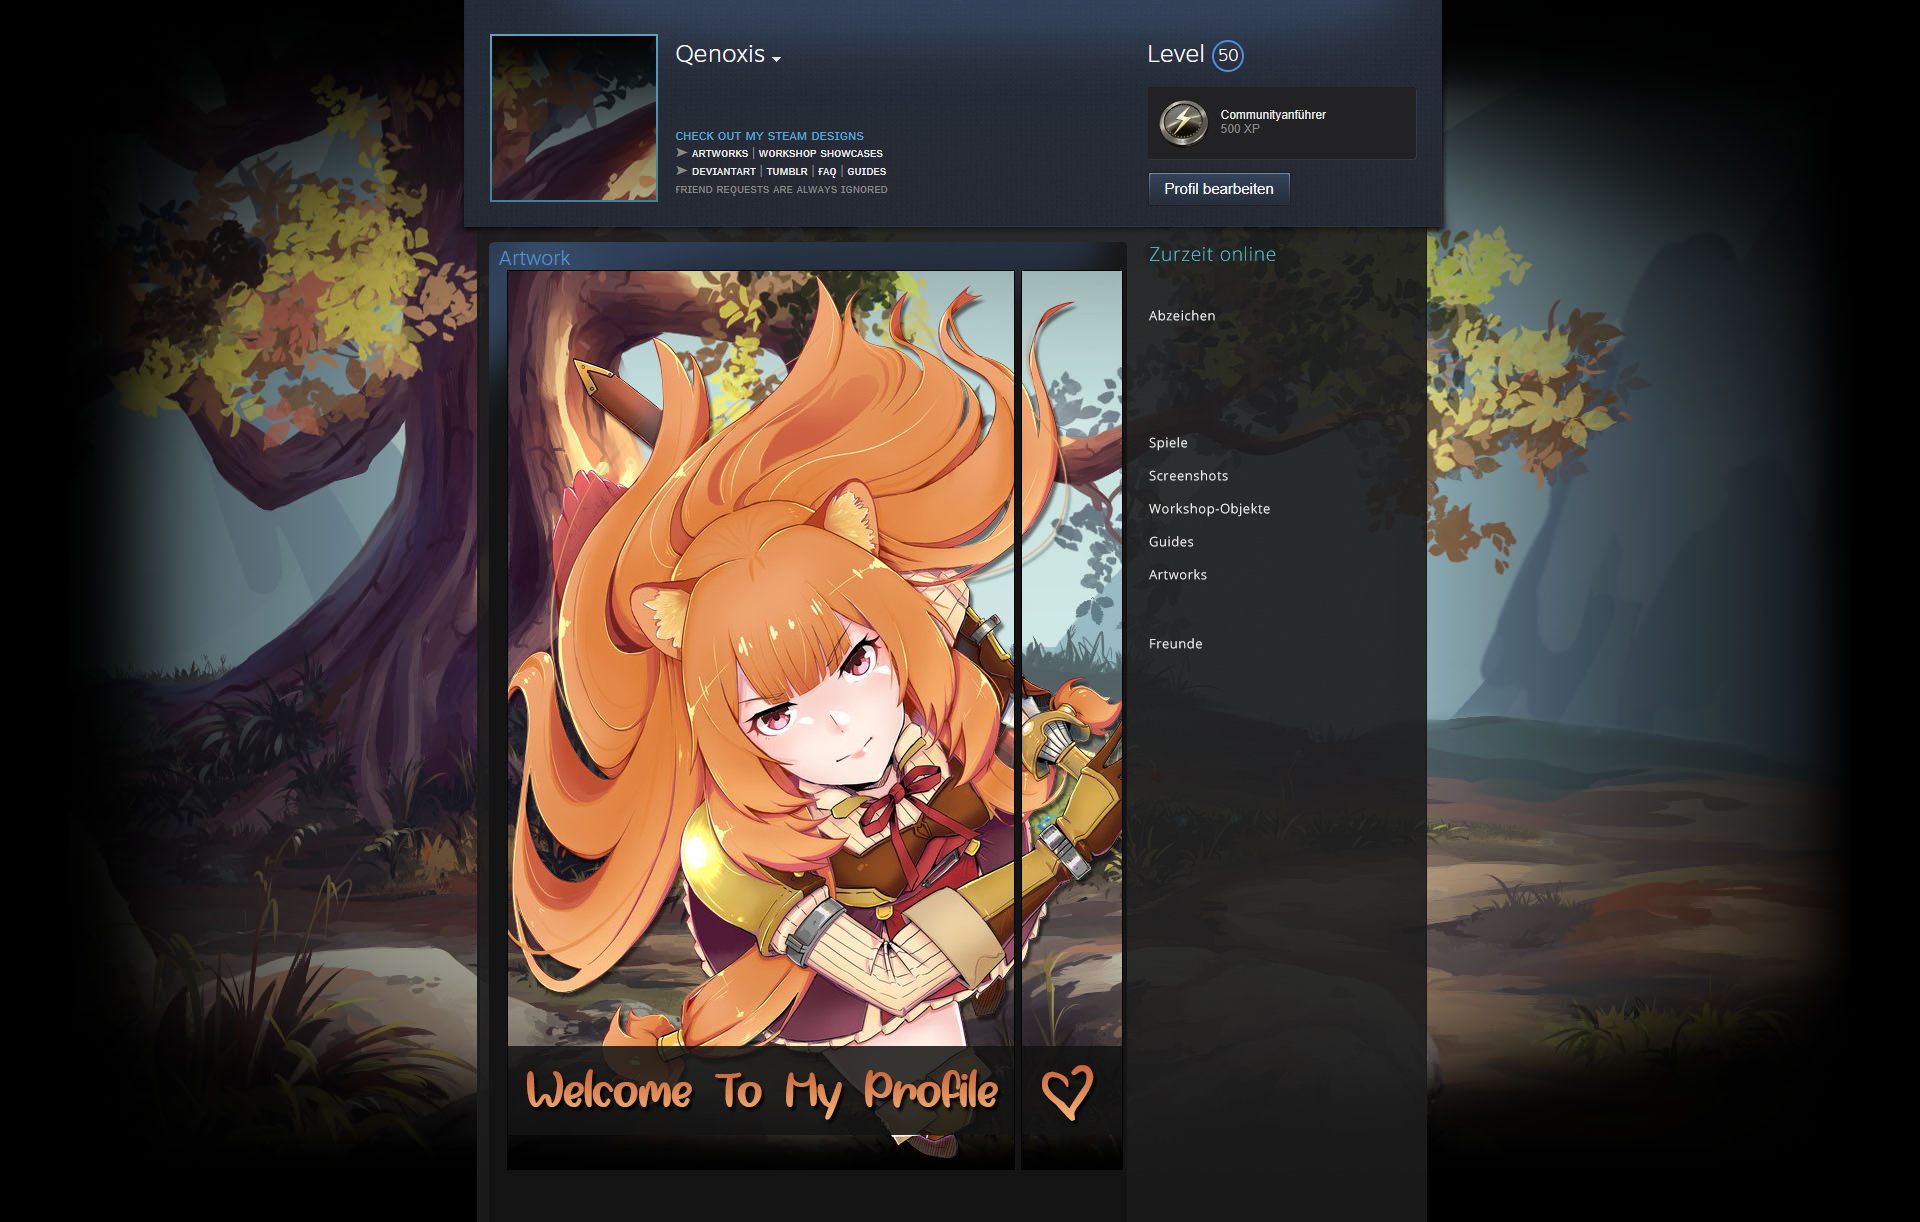 Steam Community :: Guide :: ғʀᴇᴇ ᴀʀᴛᴡᴏʀᴋ ᴅᴇsɪɢɴs